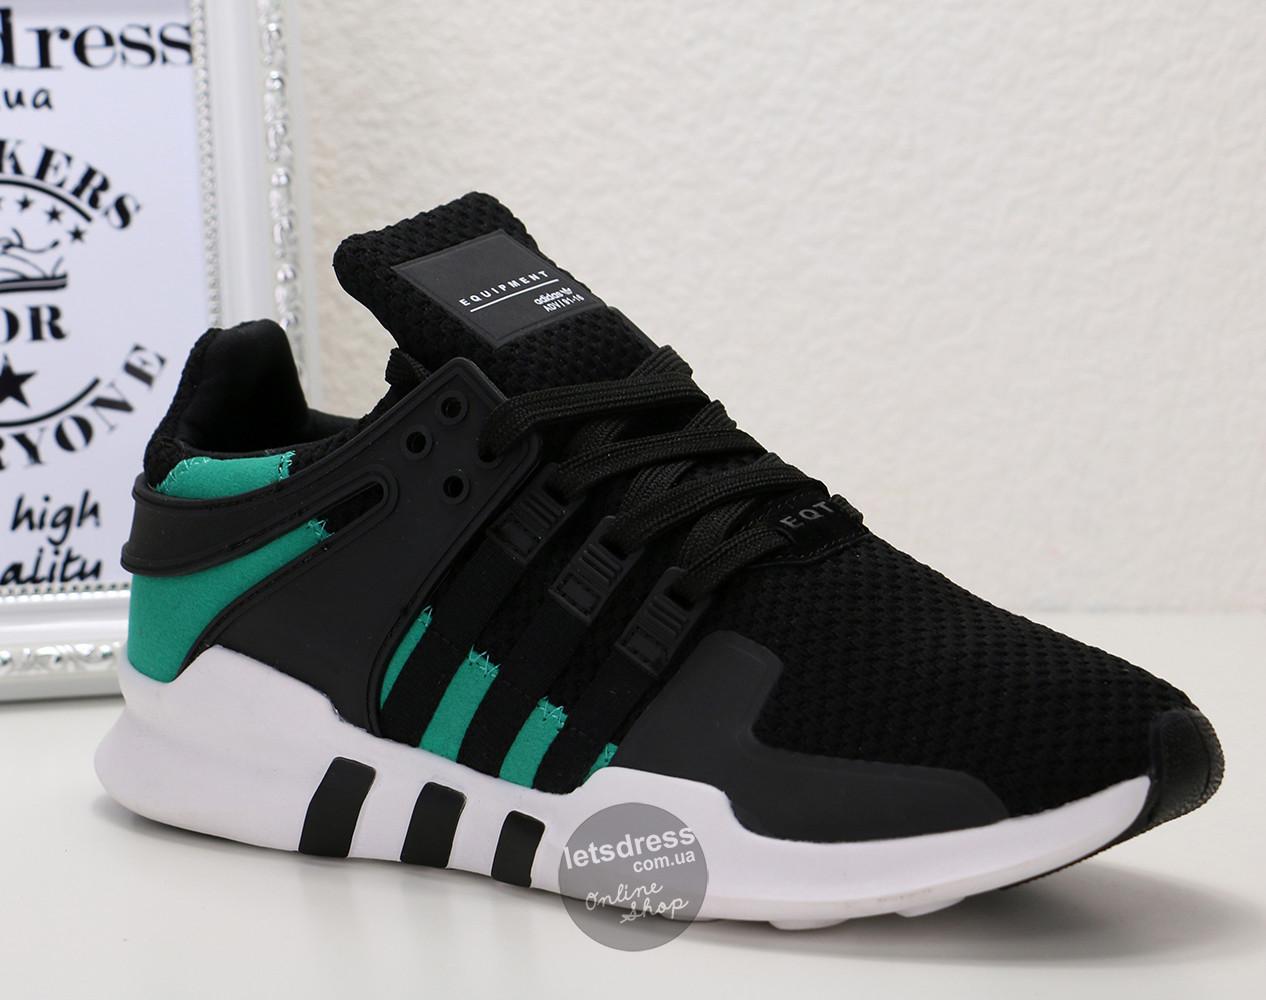 40c5a815 ... Кроссовки мужские Adidas EQT Support ADV Black Sub Green | Адидас  Суппорт АДВ черные с зеленым ...